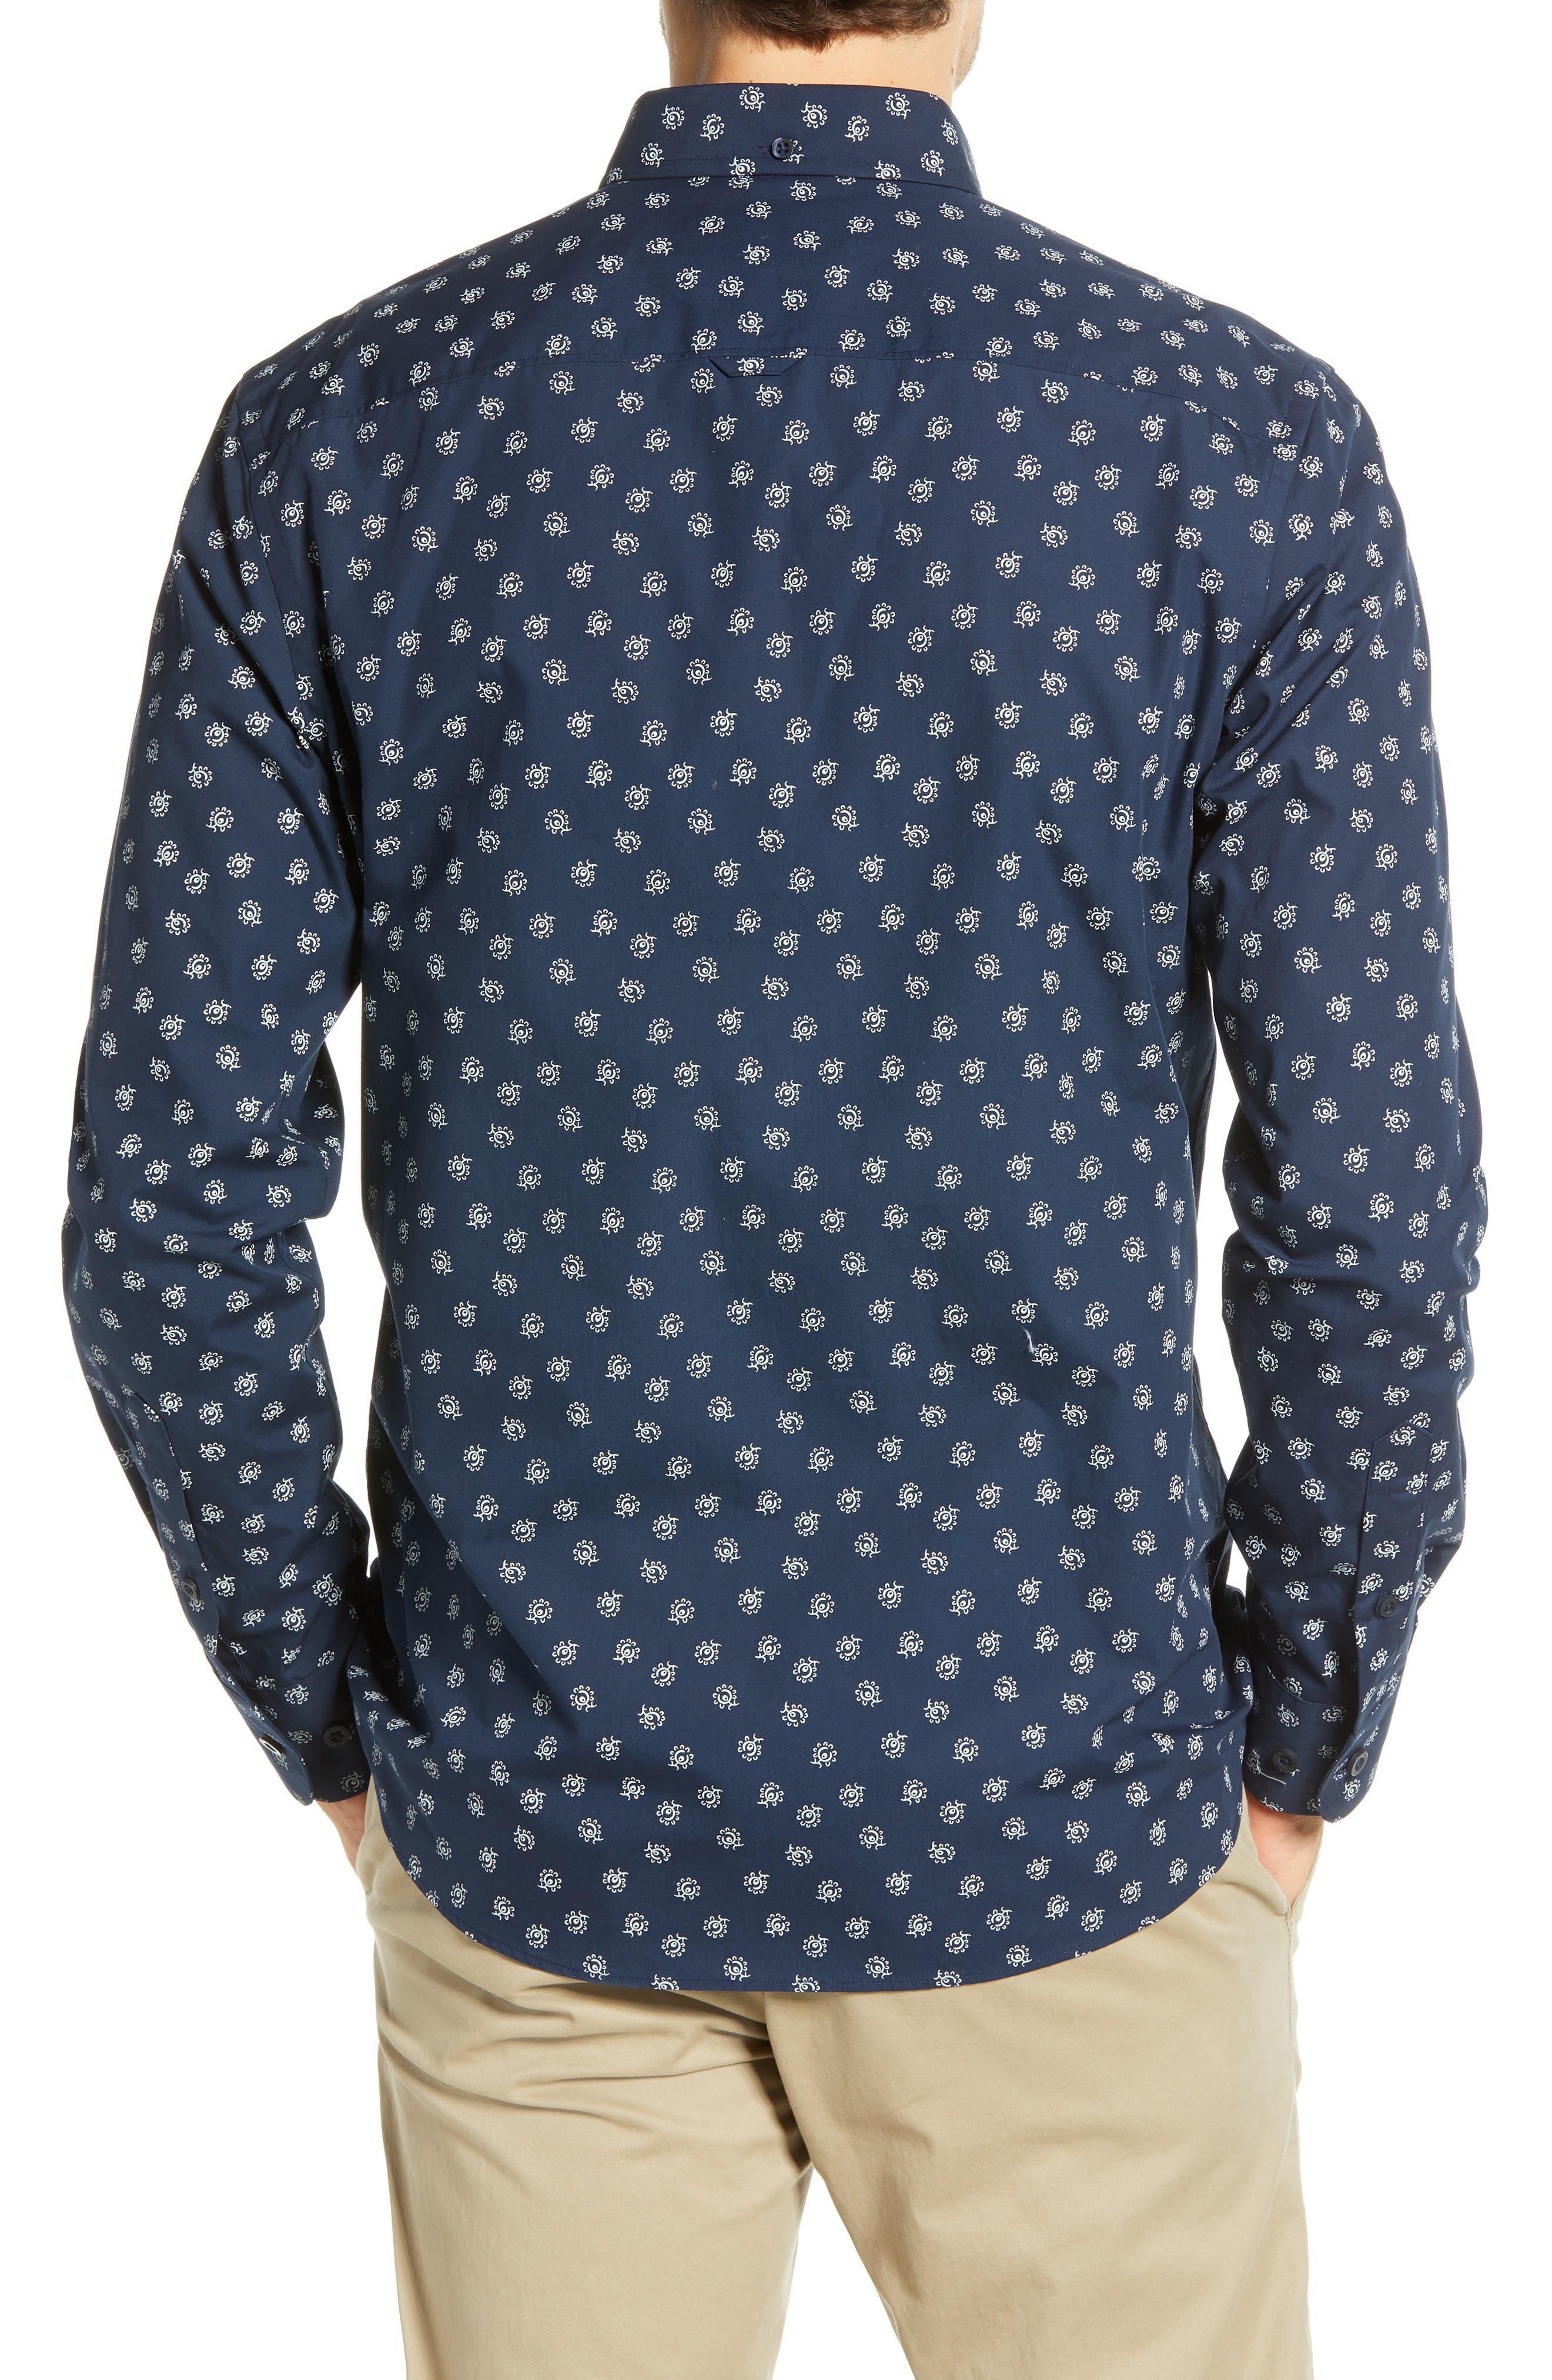 Floral Print Sport Shirt,                             Alternate thumbnail 3, color,                             NAVY IRIS FLORAL PRINT